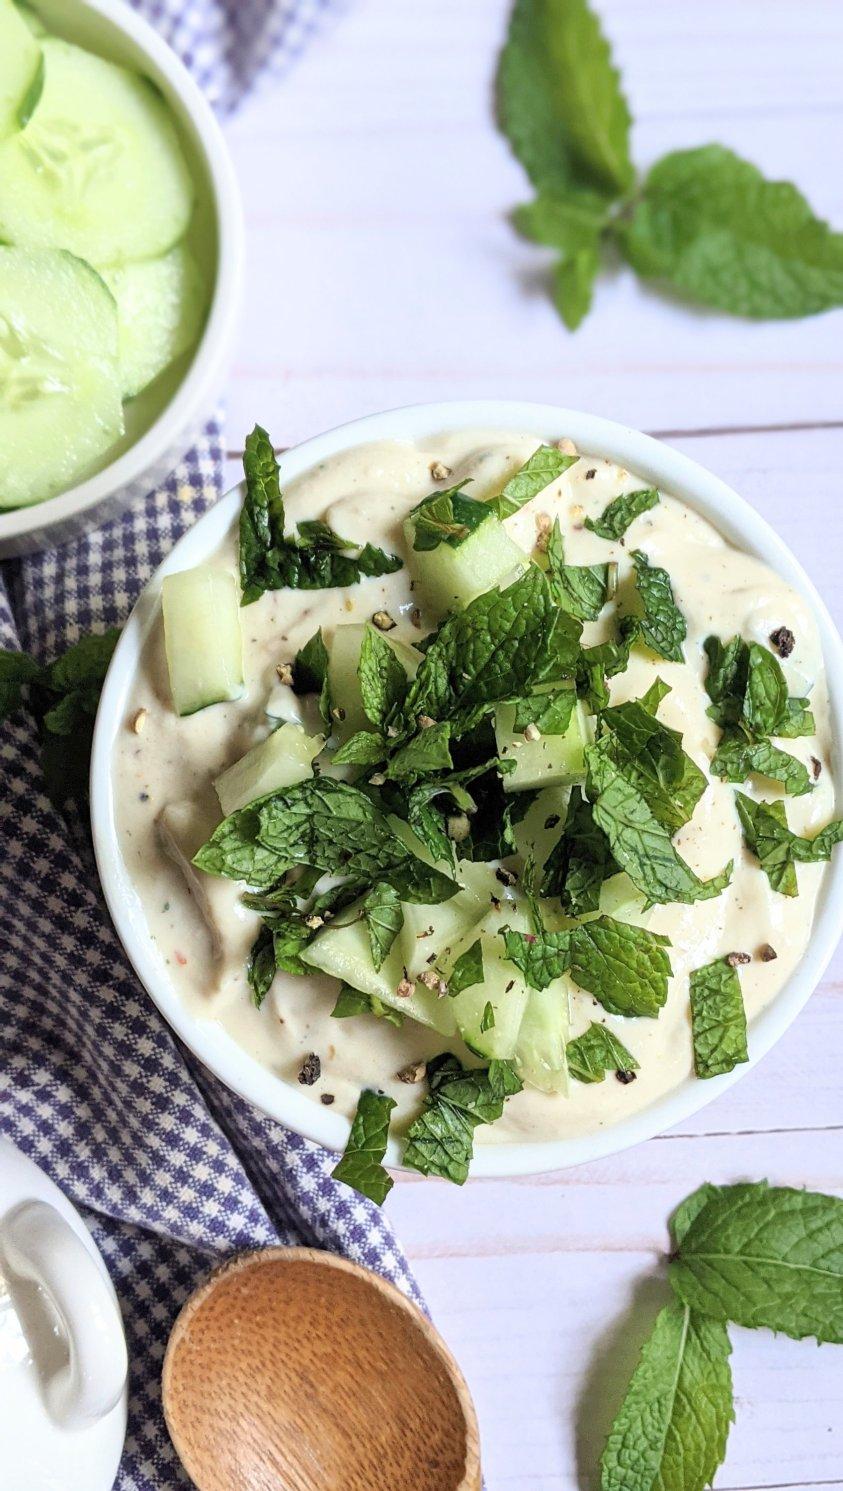 mint tzatziki without dill no dill tzatziki sauce mint cucumber yogurt sauce recipe for falafel pitas sandwiches wraps and shawarmas vegetarian and gluten free